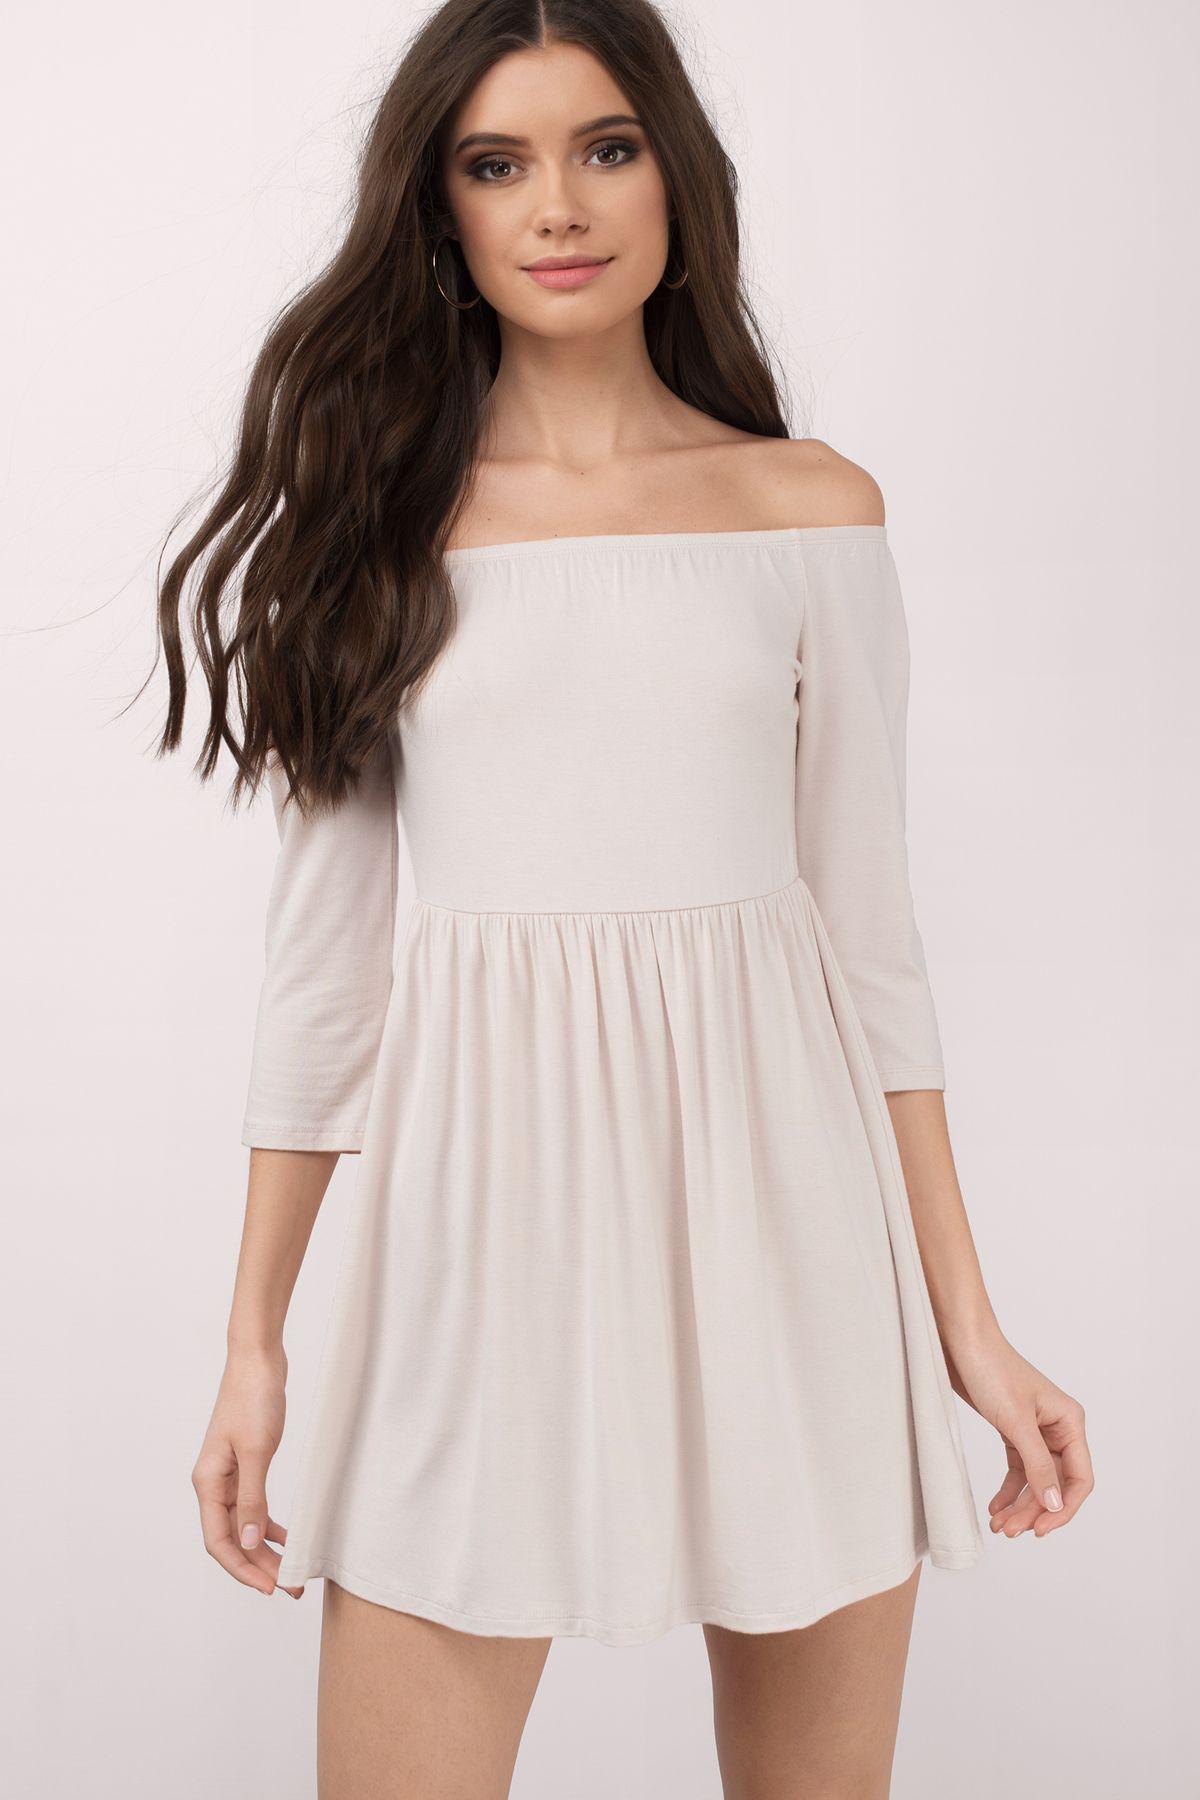 Kai Off Shoulder Skater Dress Skater Dress White Lace Skater Dress Dresses [ 1800 x 1200 Pixel ]